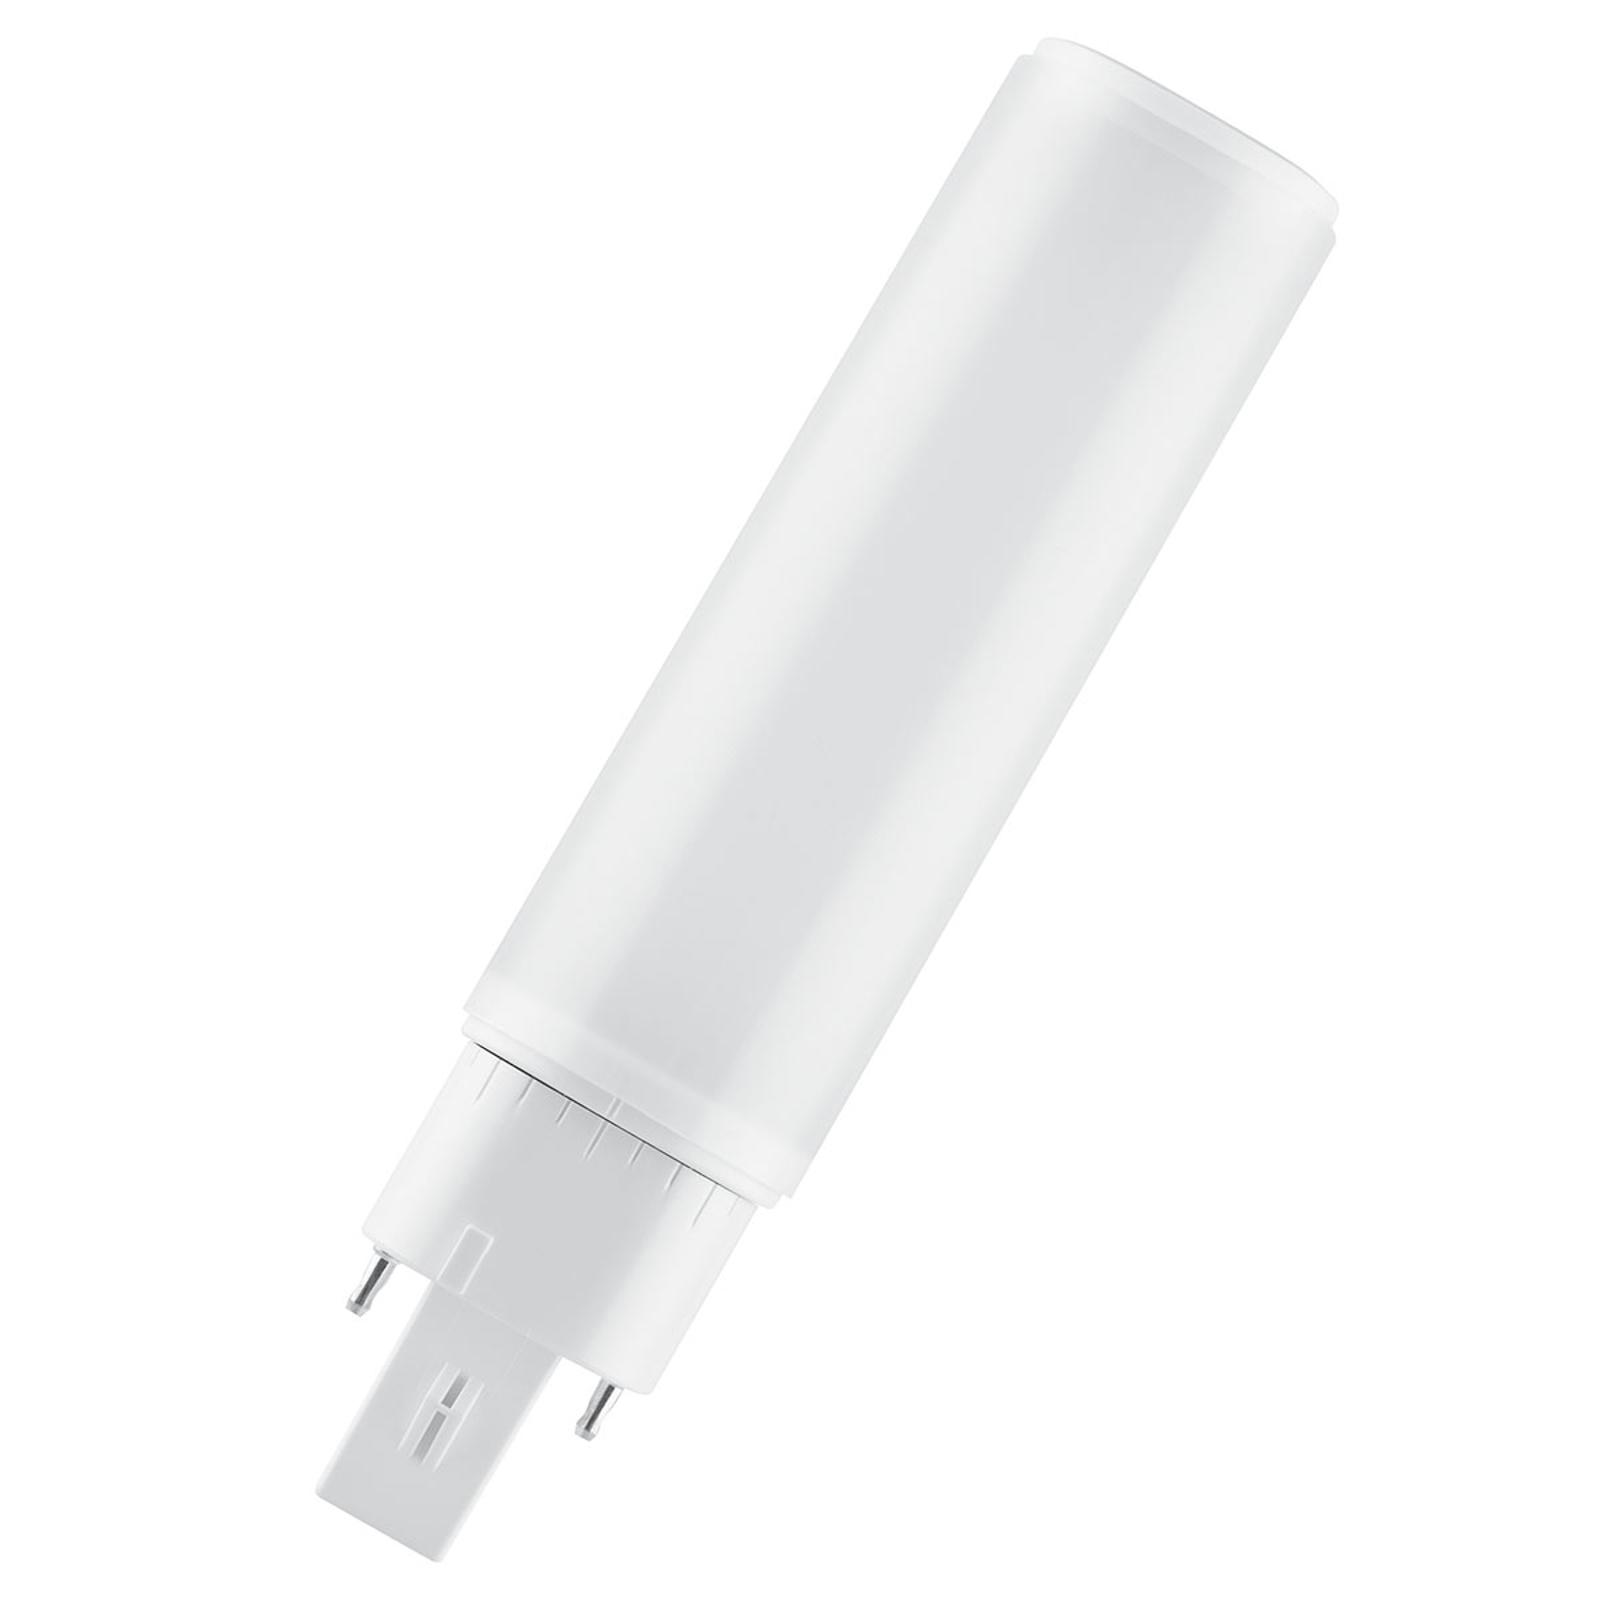 OSRAM-LED-lamppu G24q-2 7W 4 000 K